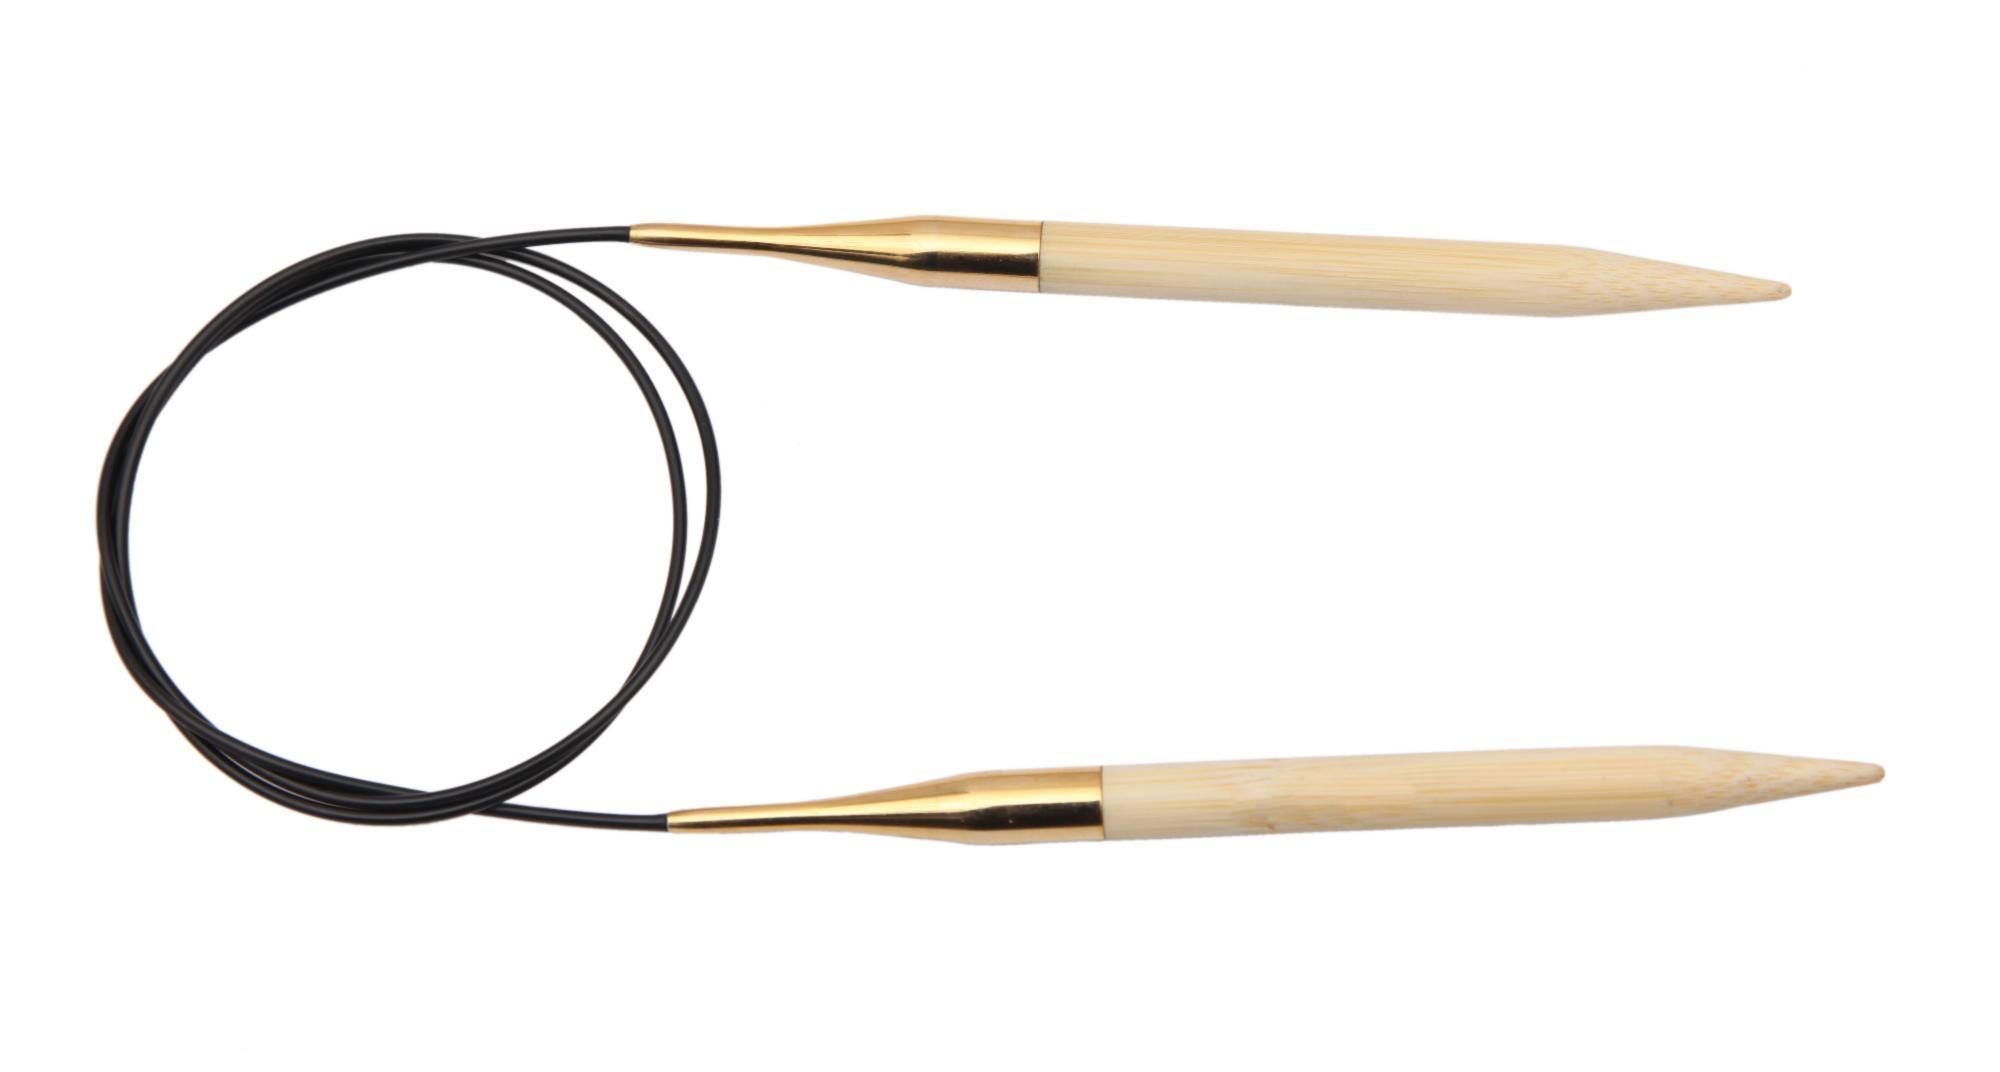 Спицы круговые 40 см Bamboo KnitPro, 22211, 6.00 мм